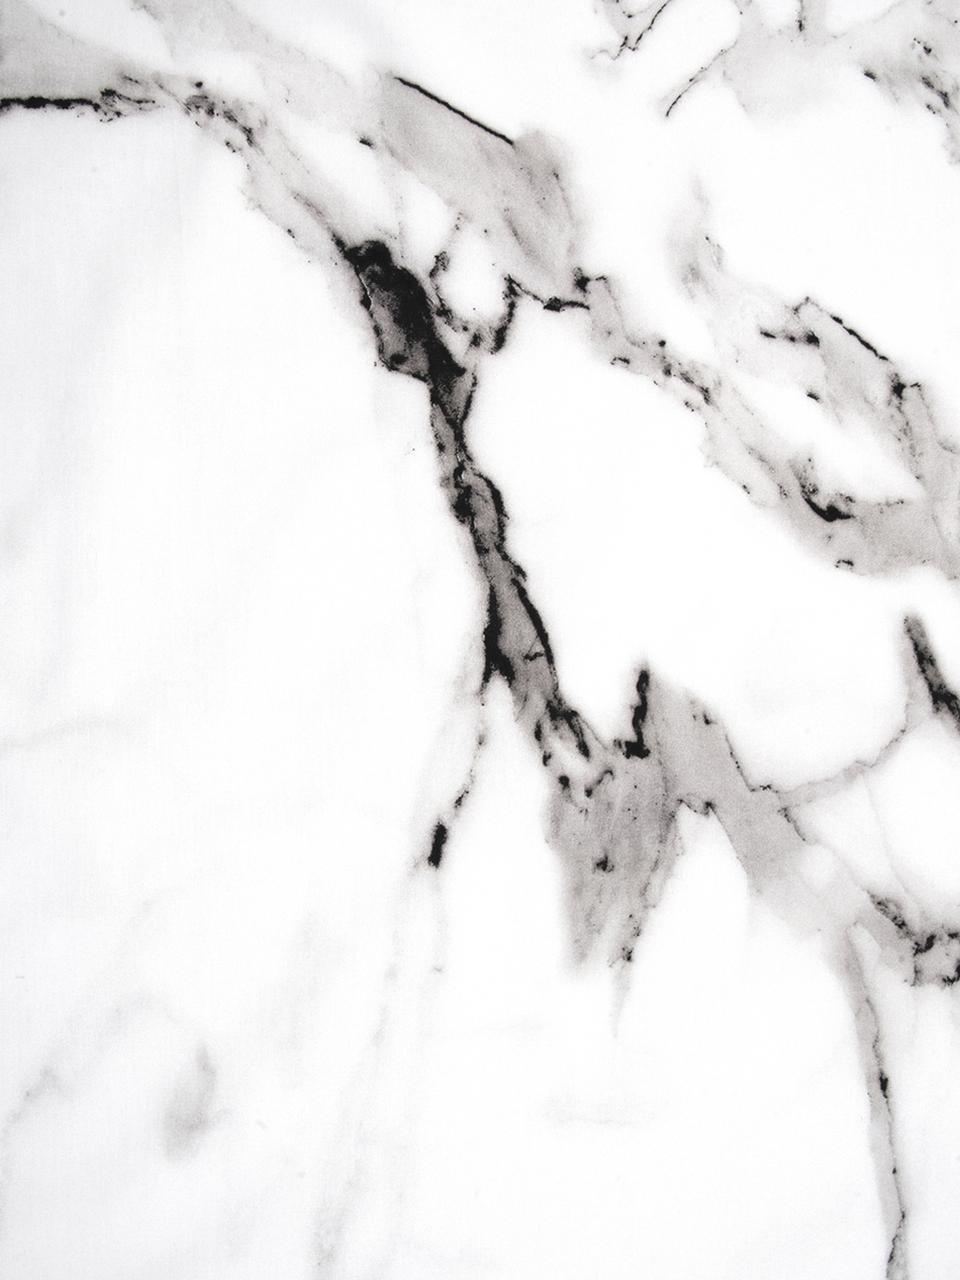 Baumwollperkal-Kissenbezüge Malin mit Marmor-Muster, 2 Stück, Webart: Perkal Fadendichte 200 TC, Vorderseite: Marmormuster, GrauRückseite: Hellgrau, Uni, 40 x 80 cm